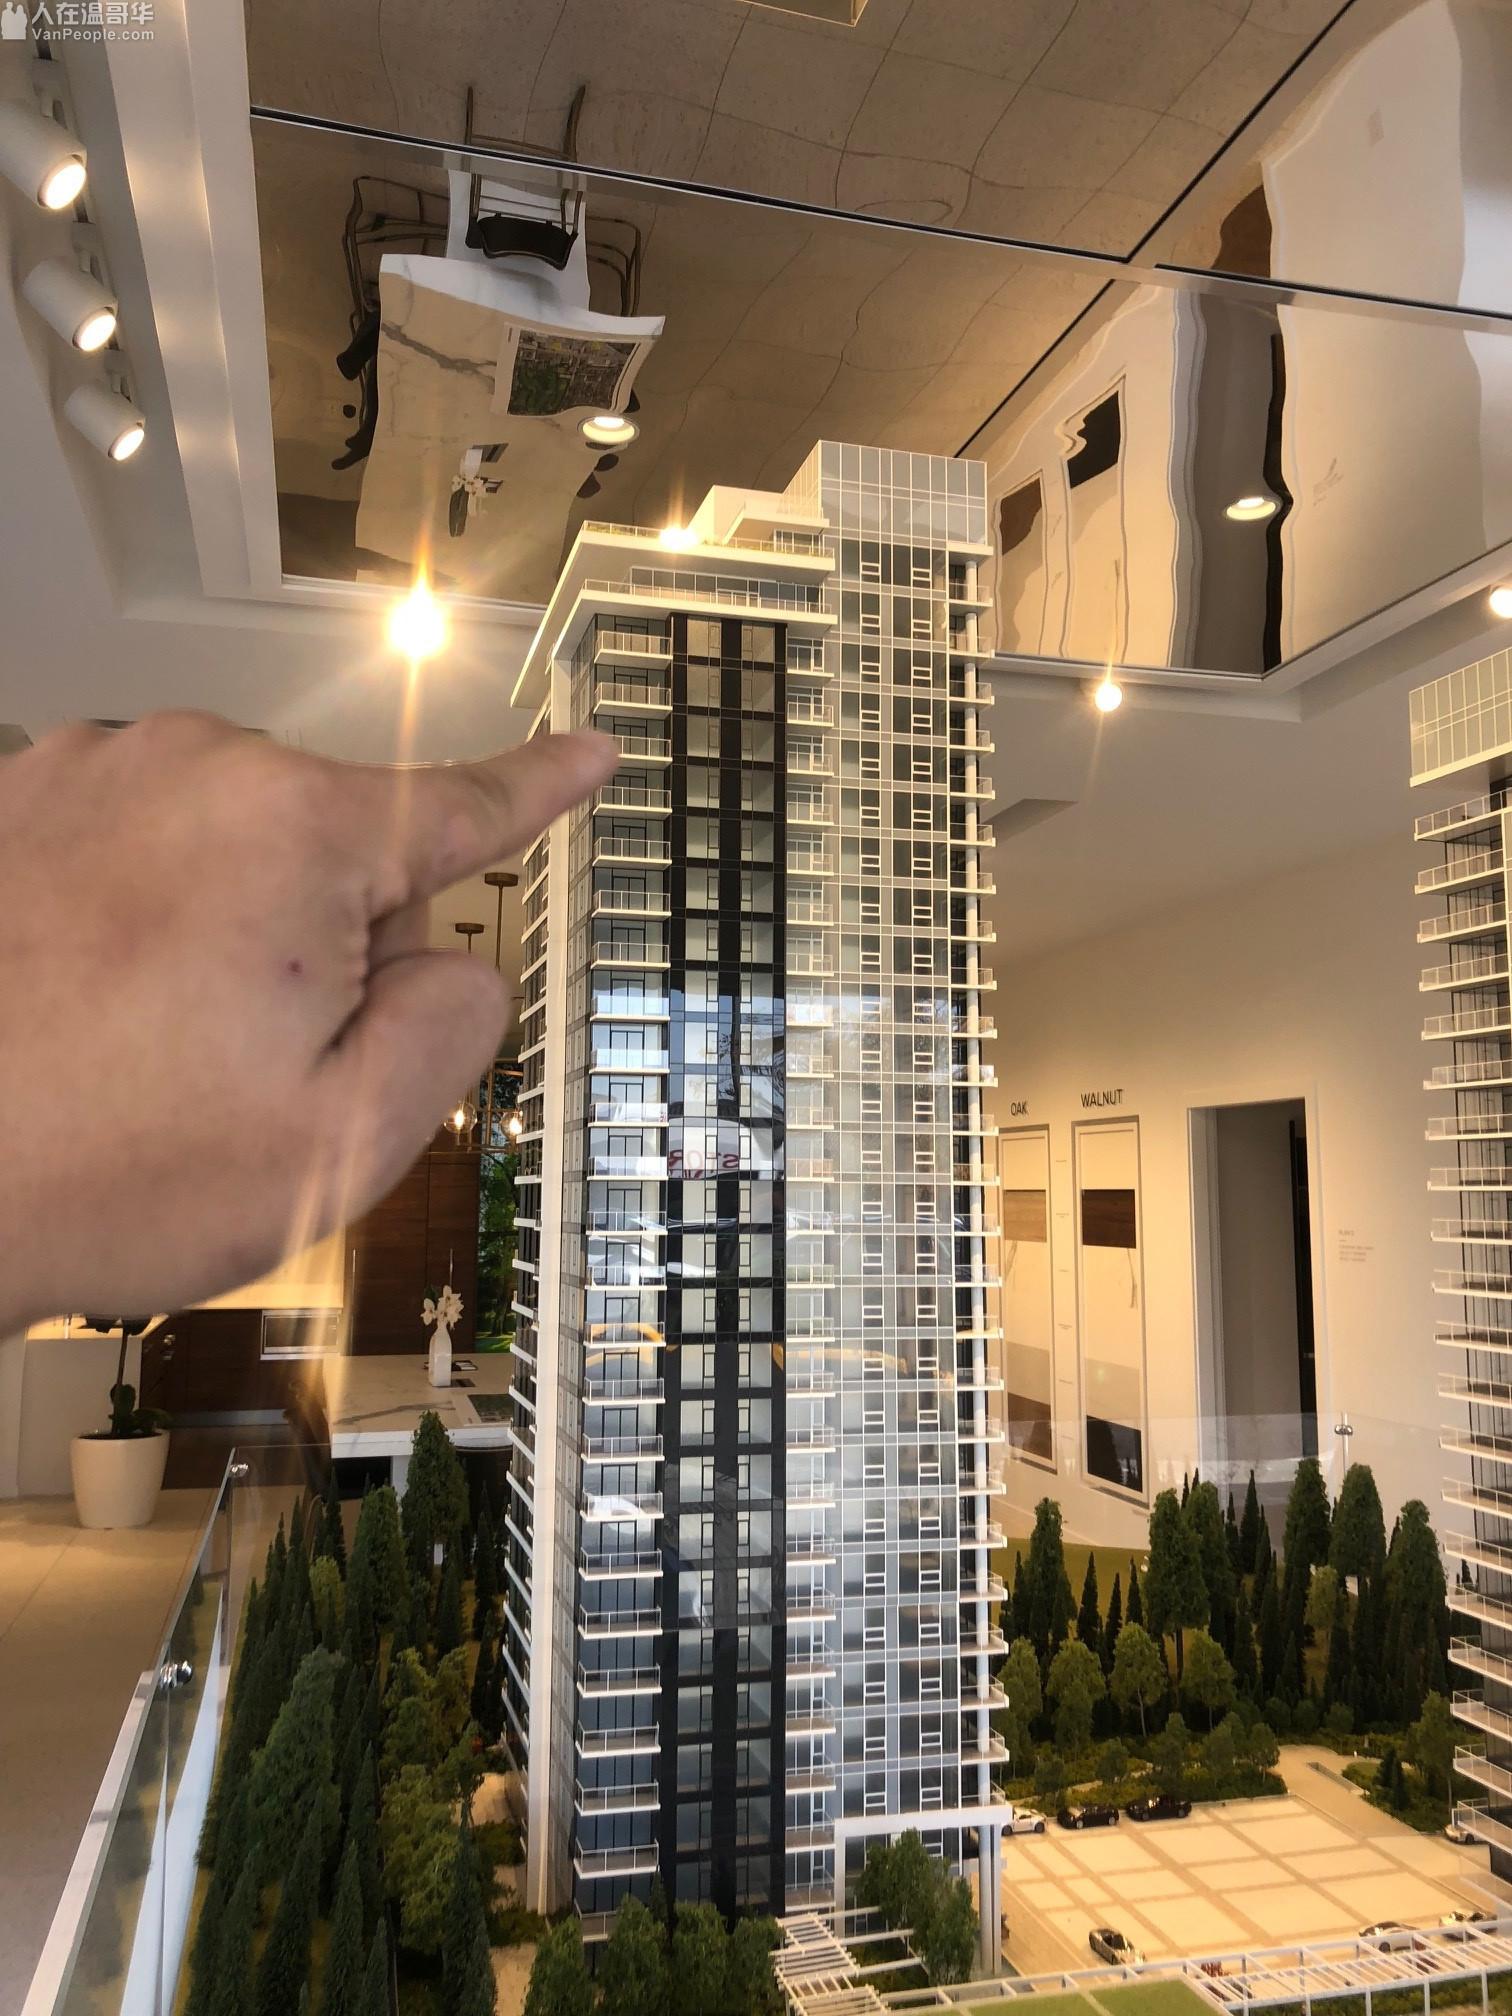 (平价卖) Wynwood Burquitlam) 21楼 & 4楼 各 1房